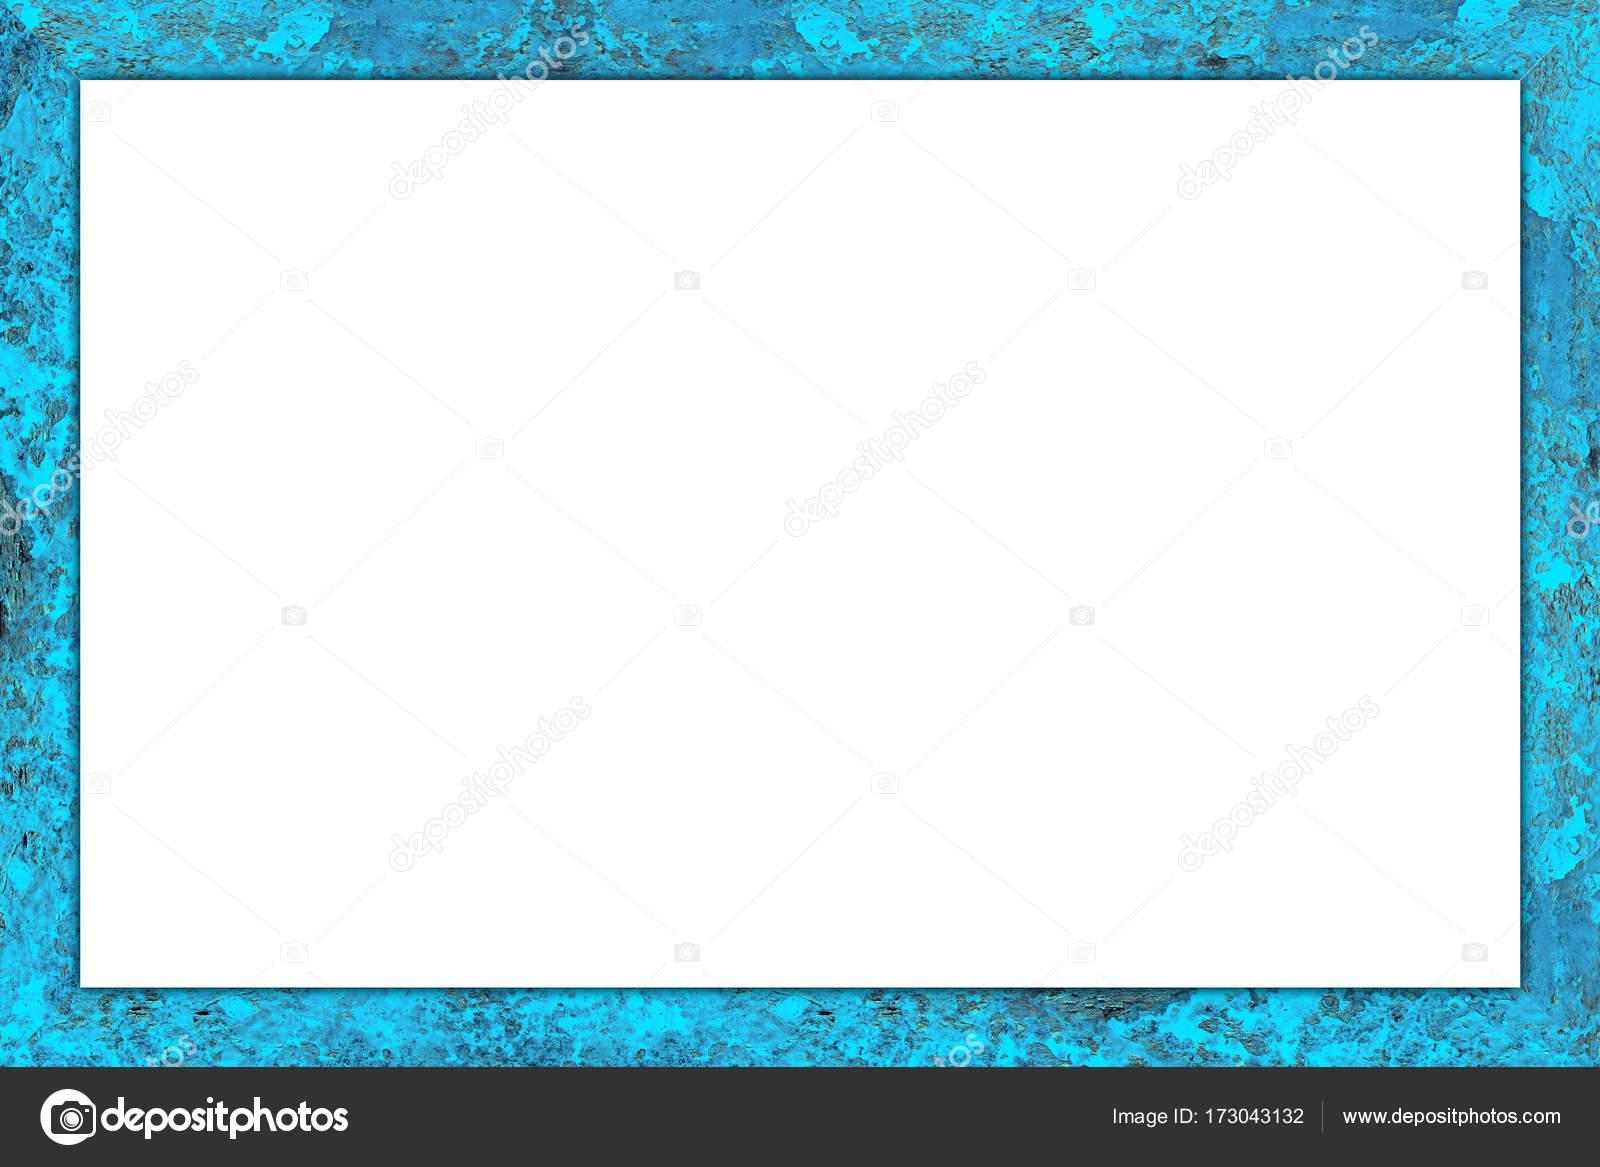 alte blaue verwitterte Holz bunte Bilderrahmen — Stockfoto ...